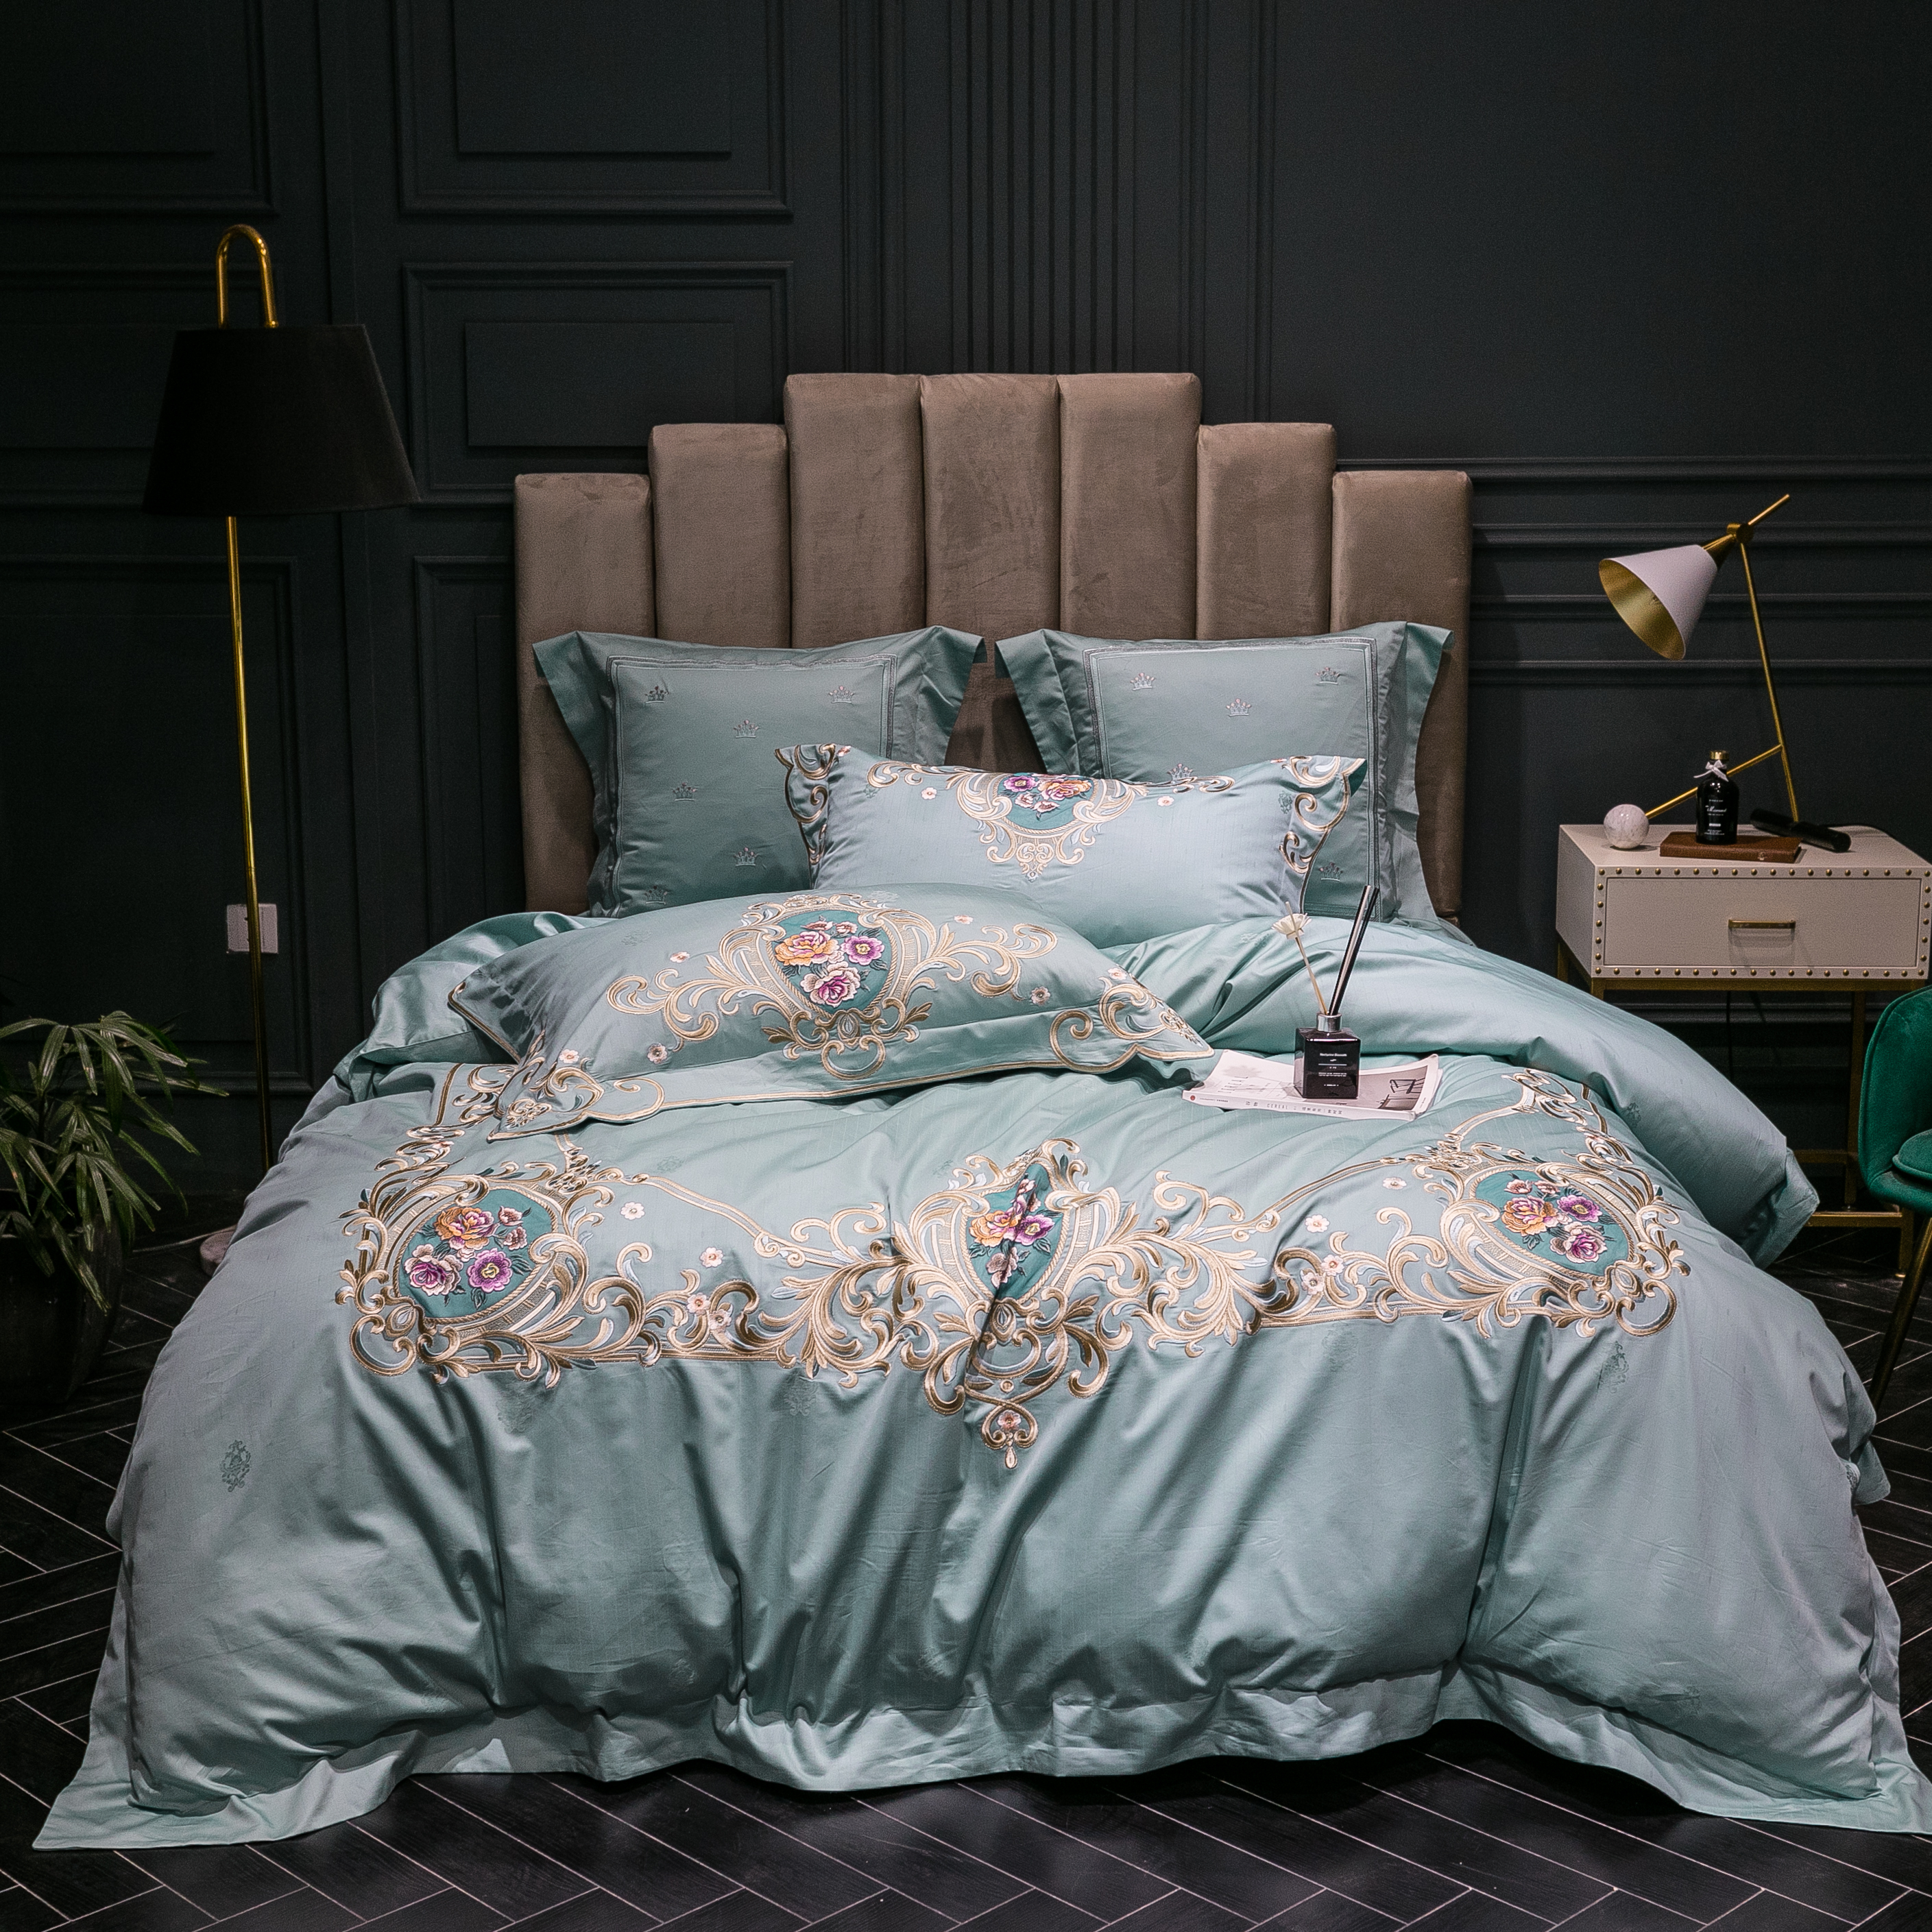 Luxury European Styel embroidery Bedding set 100S egyptian cotton Duvet cover Bed Sheet/Linen Pillowcases 4/6pcsLuxury European Styel embroidery Bedding set 100S egyptian cotton Duvet cover Bed Sheet/Linen Pillowcases 4/6pcs